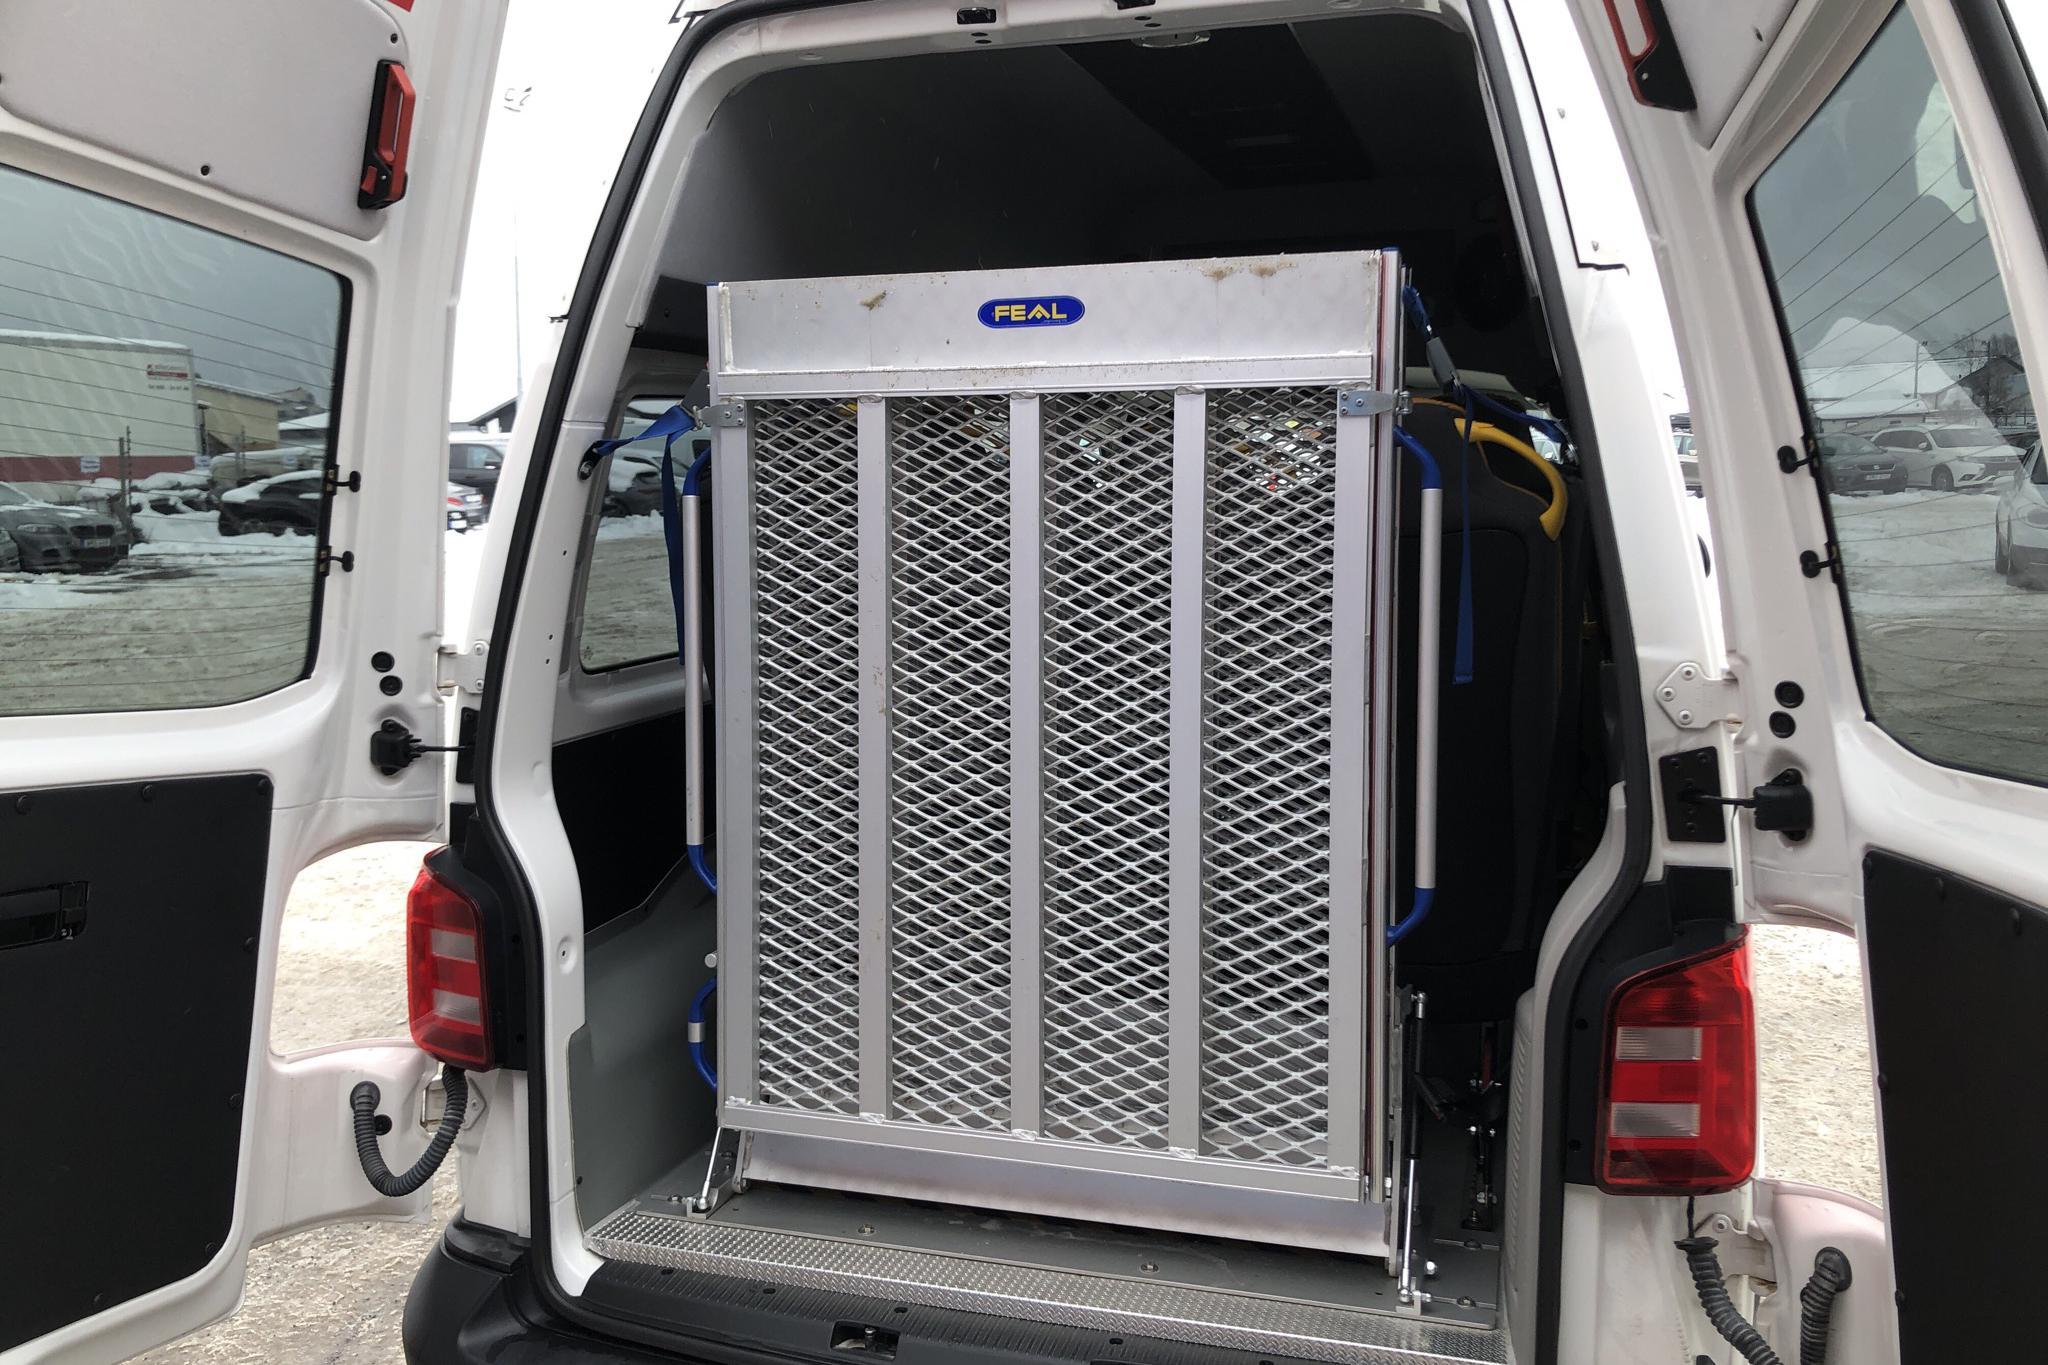 VW Transporter T6 2.0 TDI BMT (204hk) - 69 180 km - Automatic - white - 2016